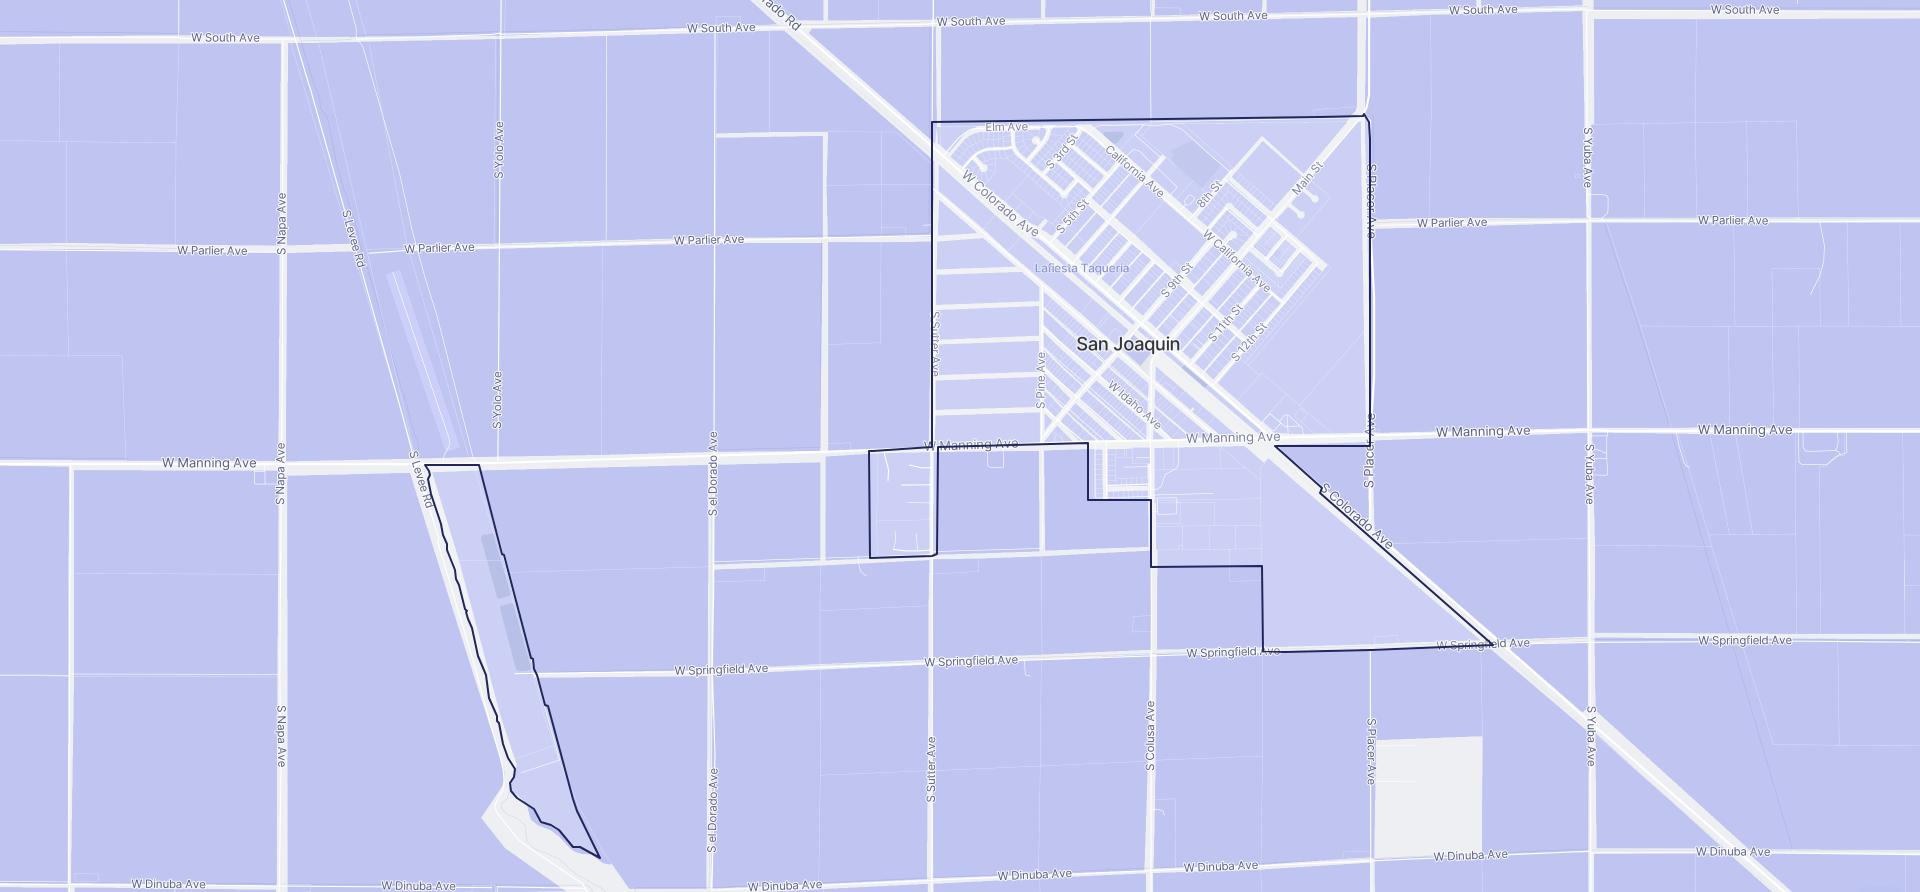 Image of San Joaquin boundaries on a map.